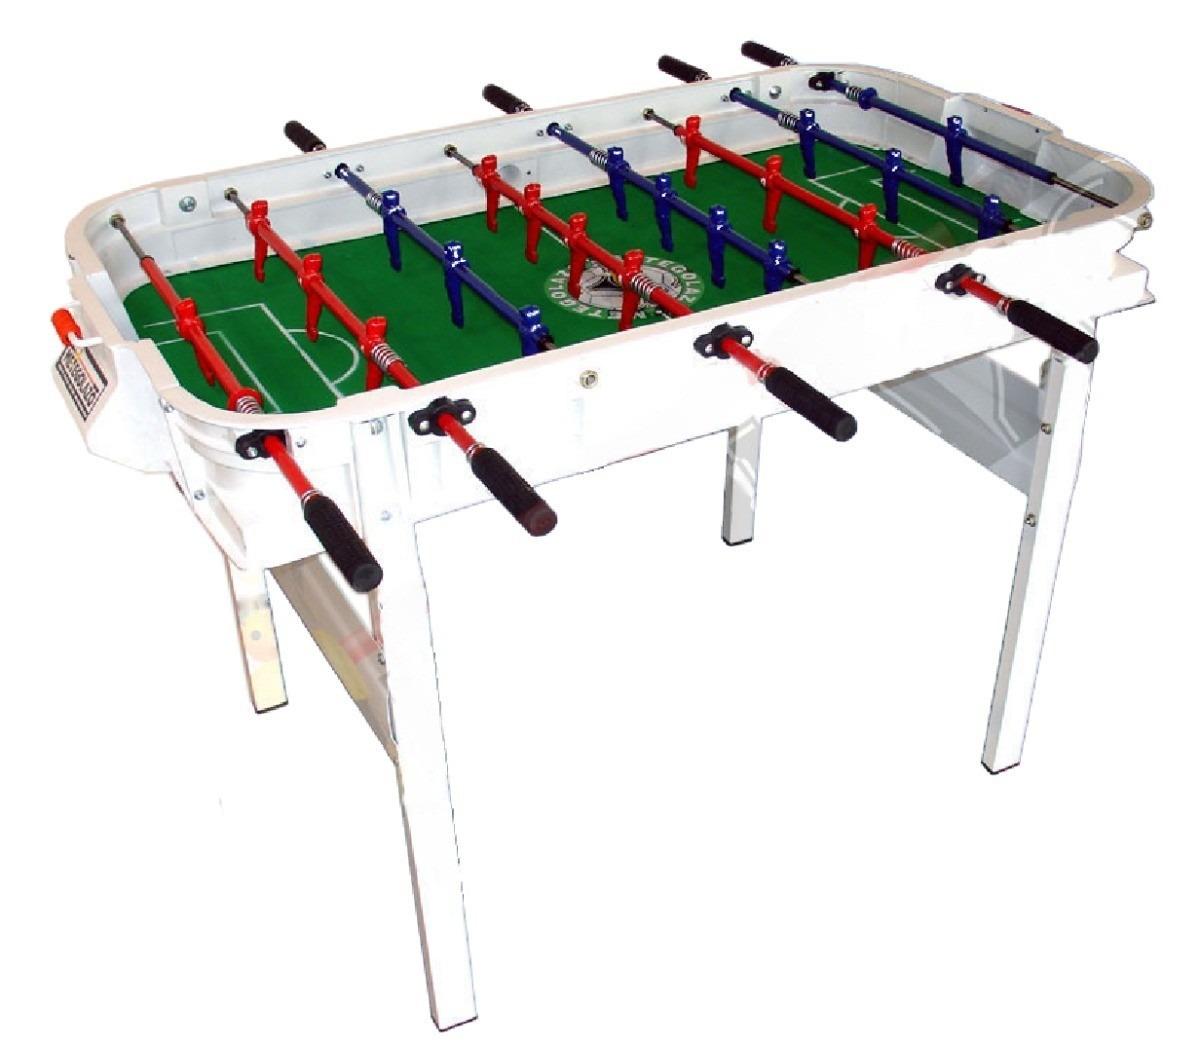 Alquiler mesas de ping pong metegoles tejos plaza etc en mercado libre - Mesas de pinpon ...